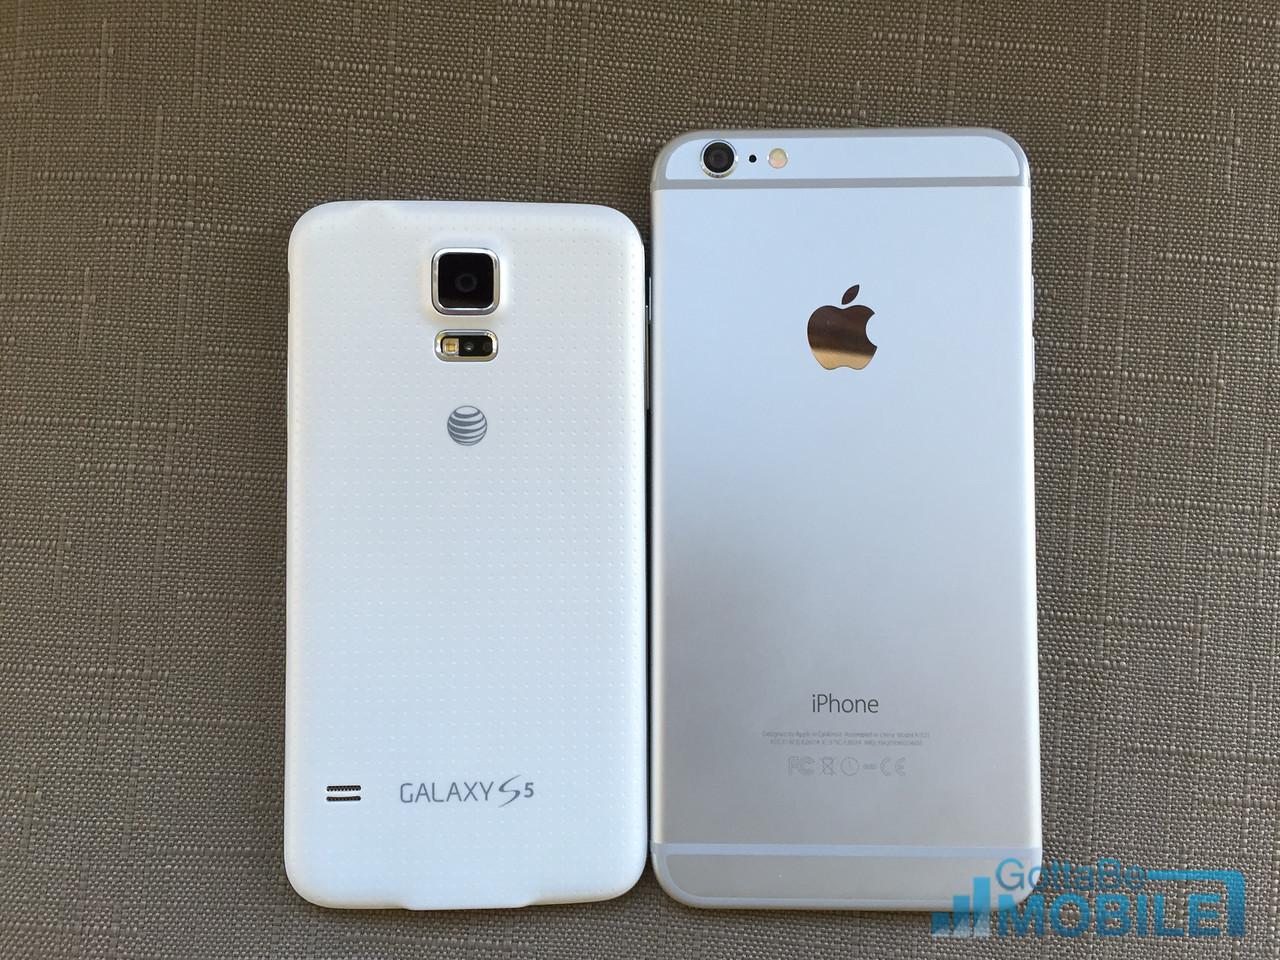 Samsung Galaxy S6 vs. Galaxy S5: What We Know So Far